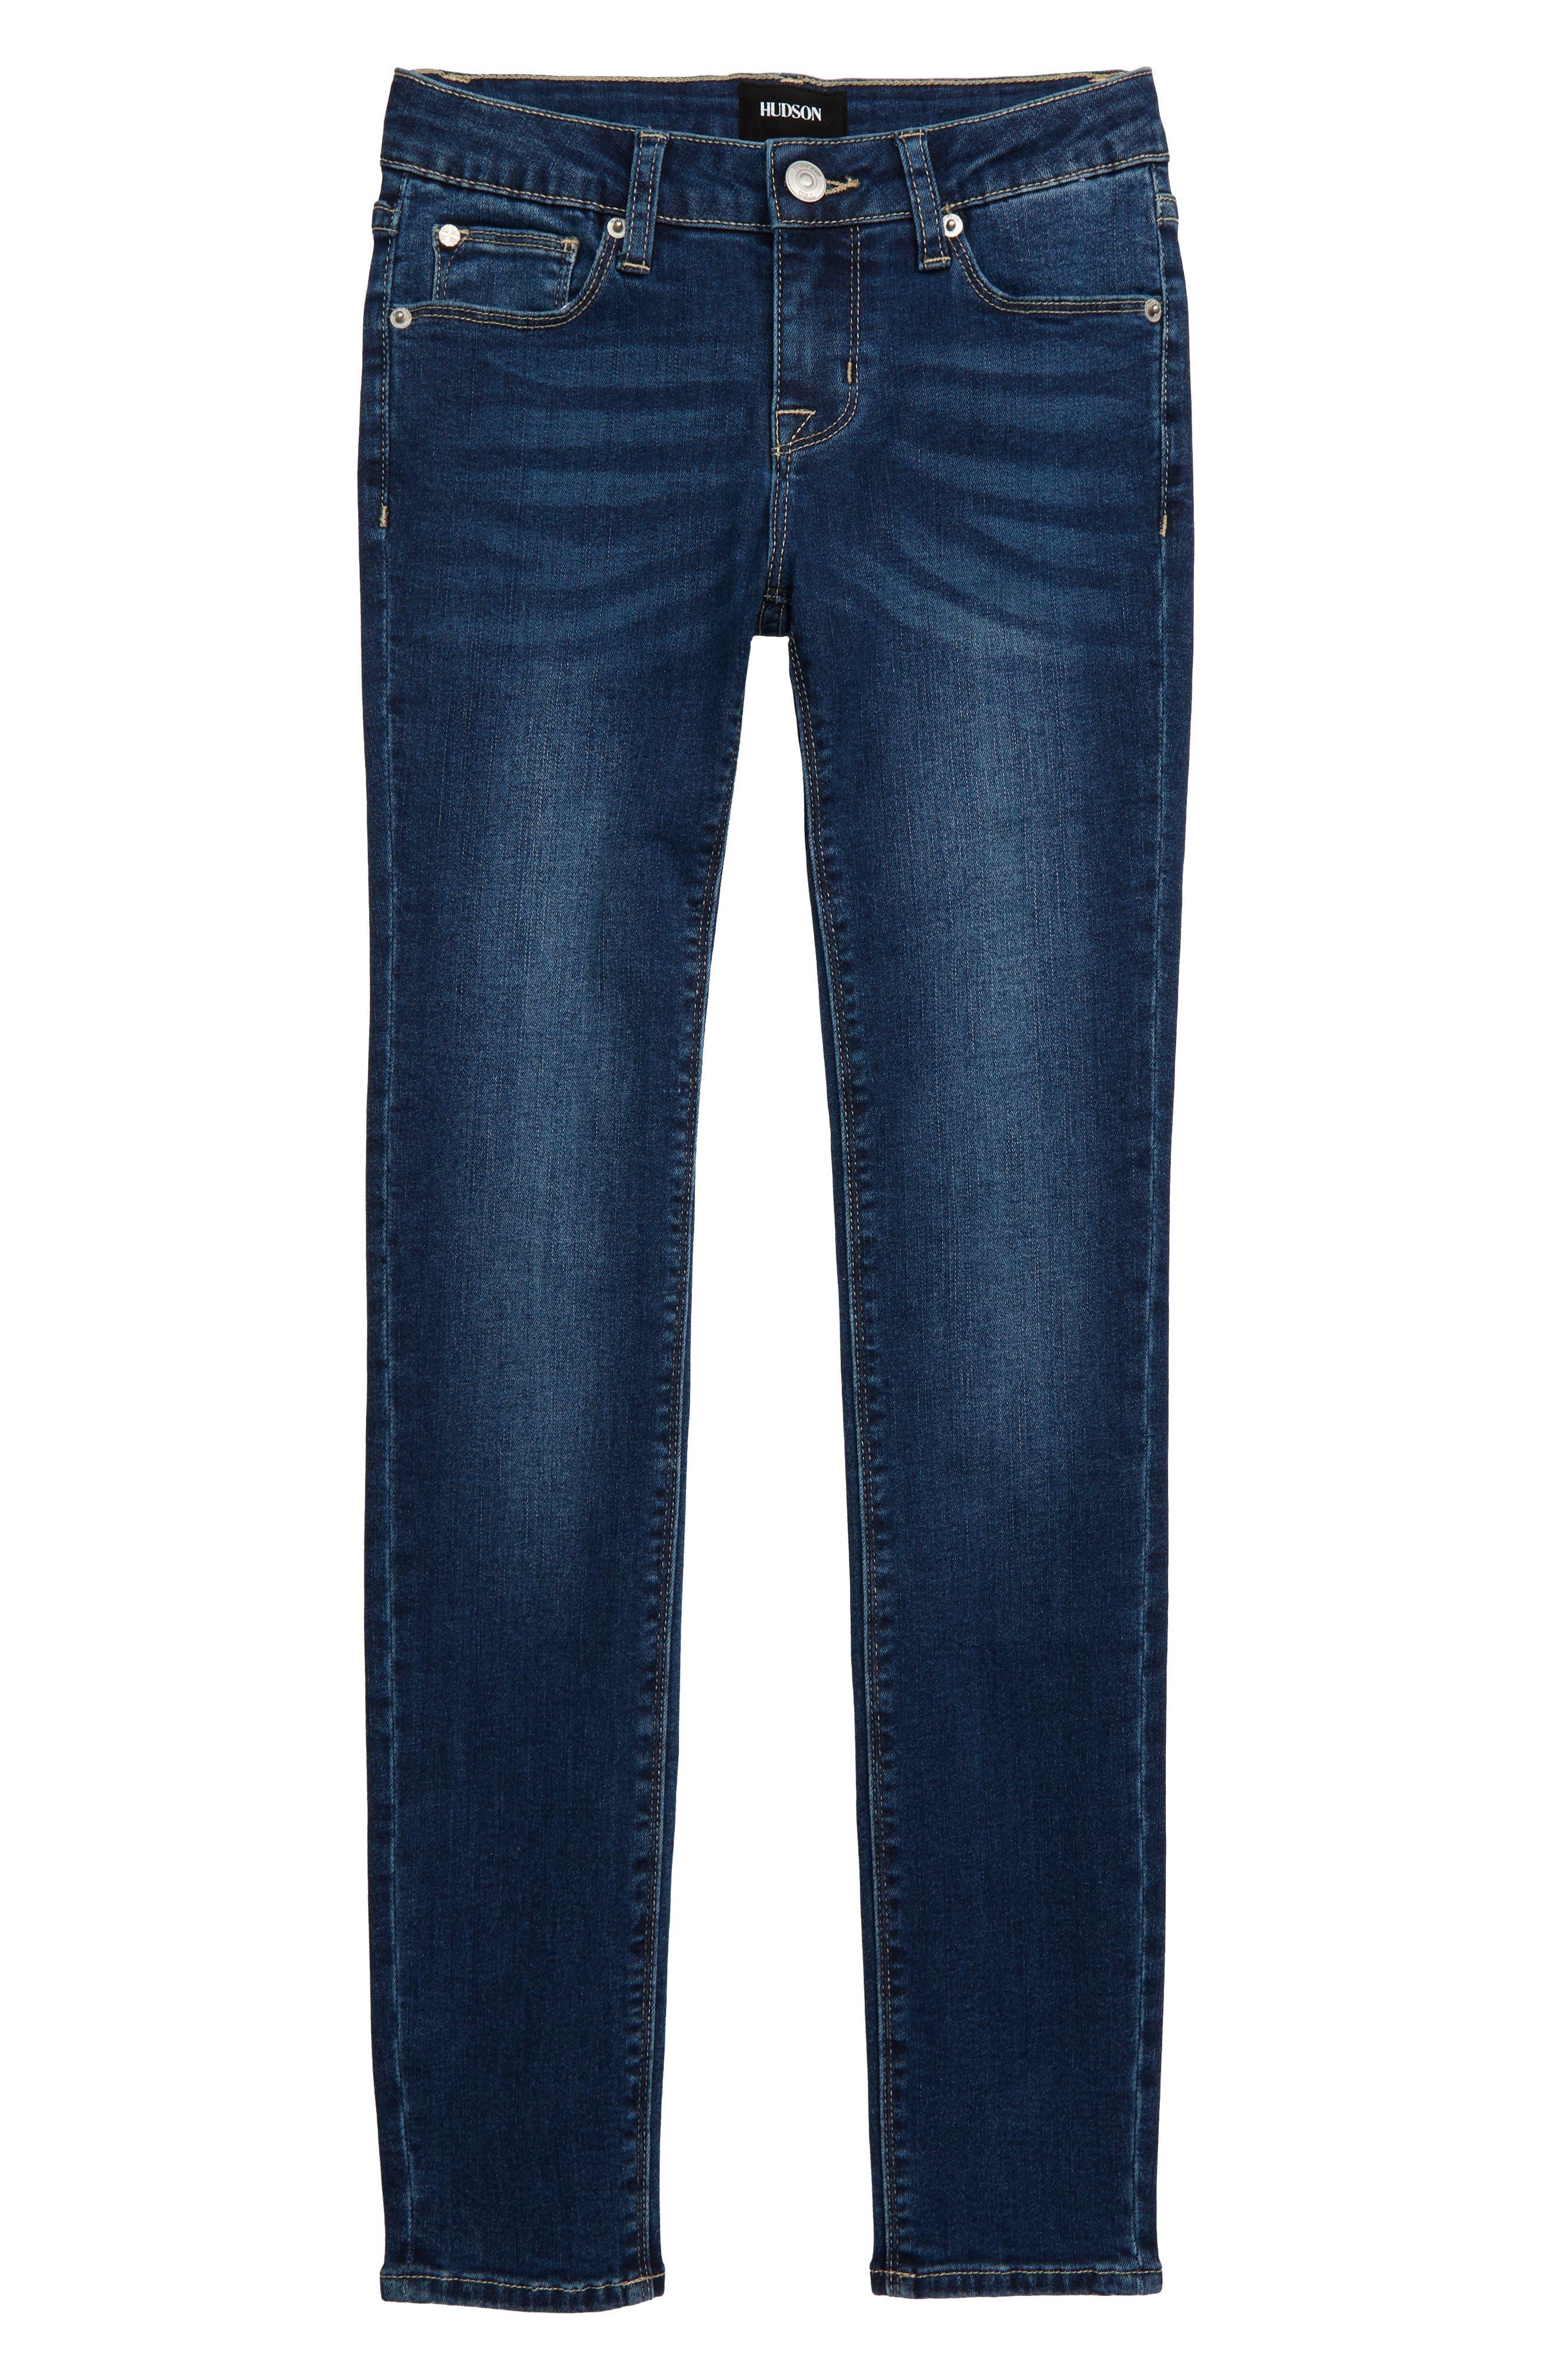 Girls Hudson Jeans Christa Skinny Jeans Size 7  Blue